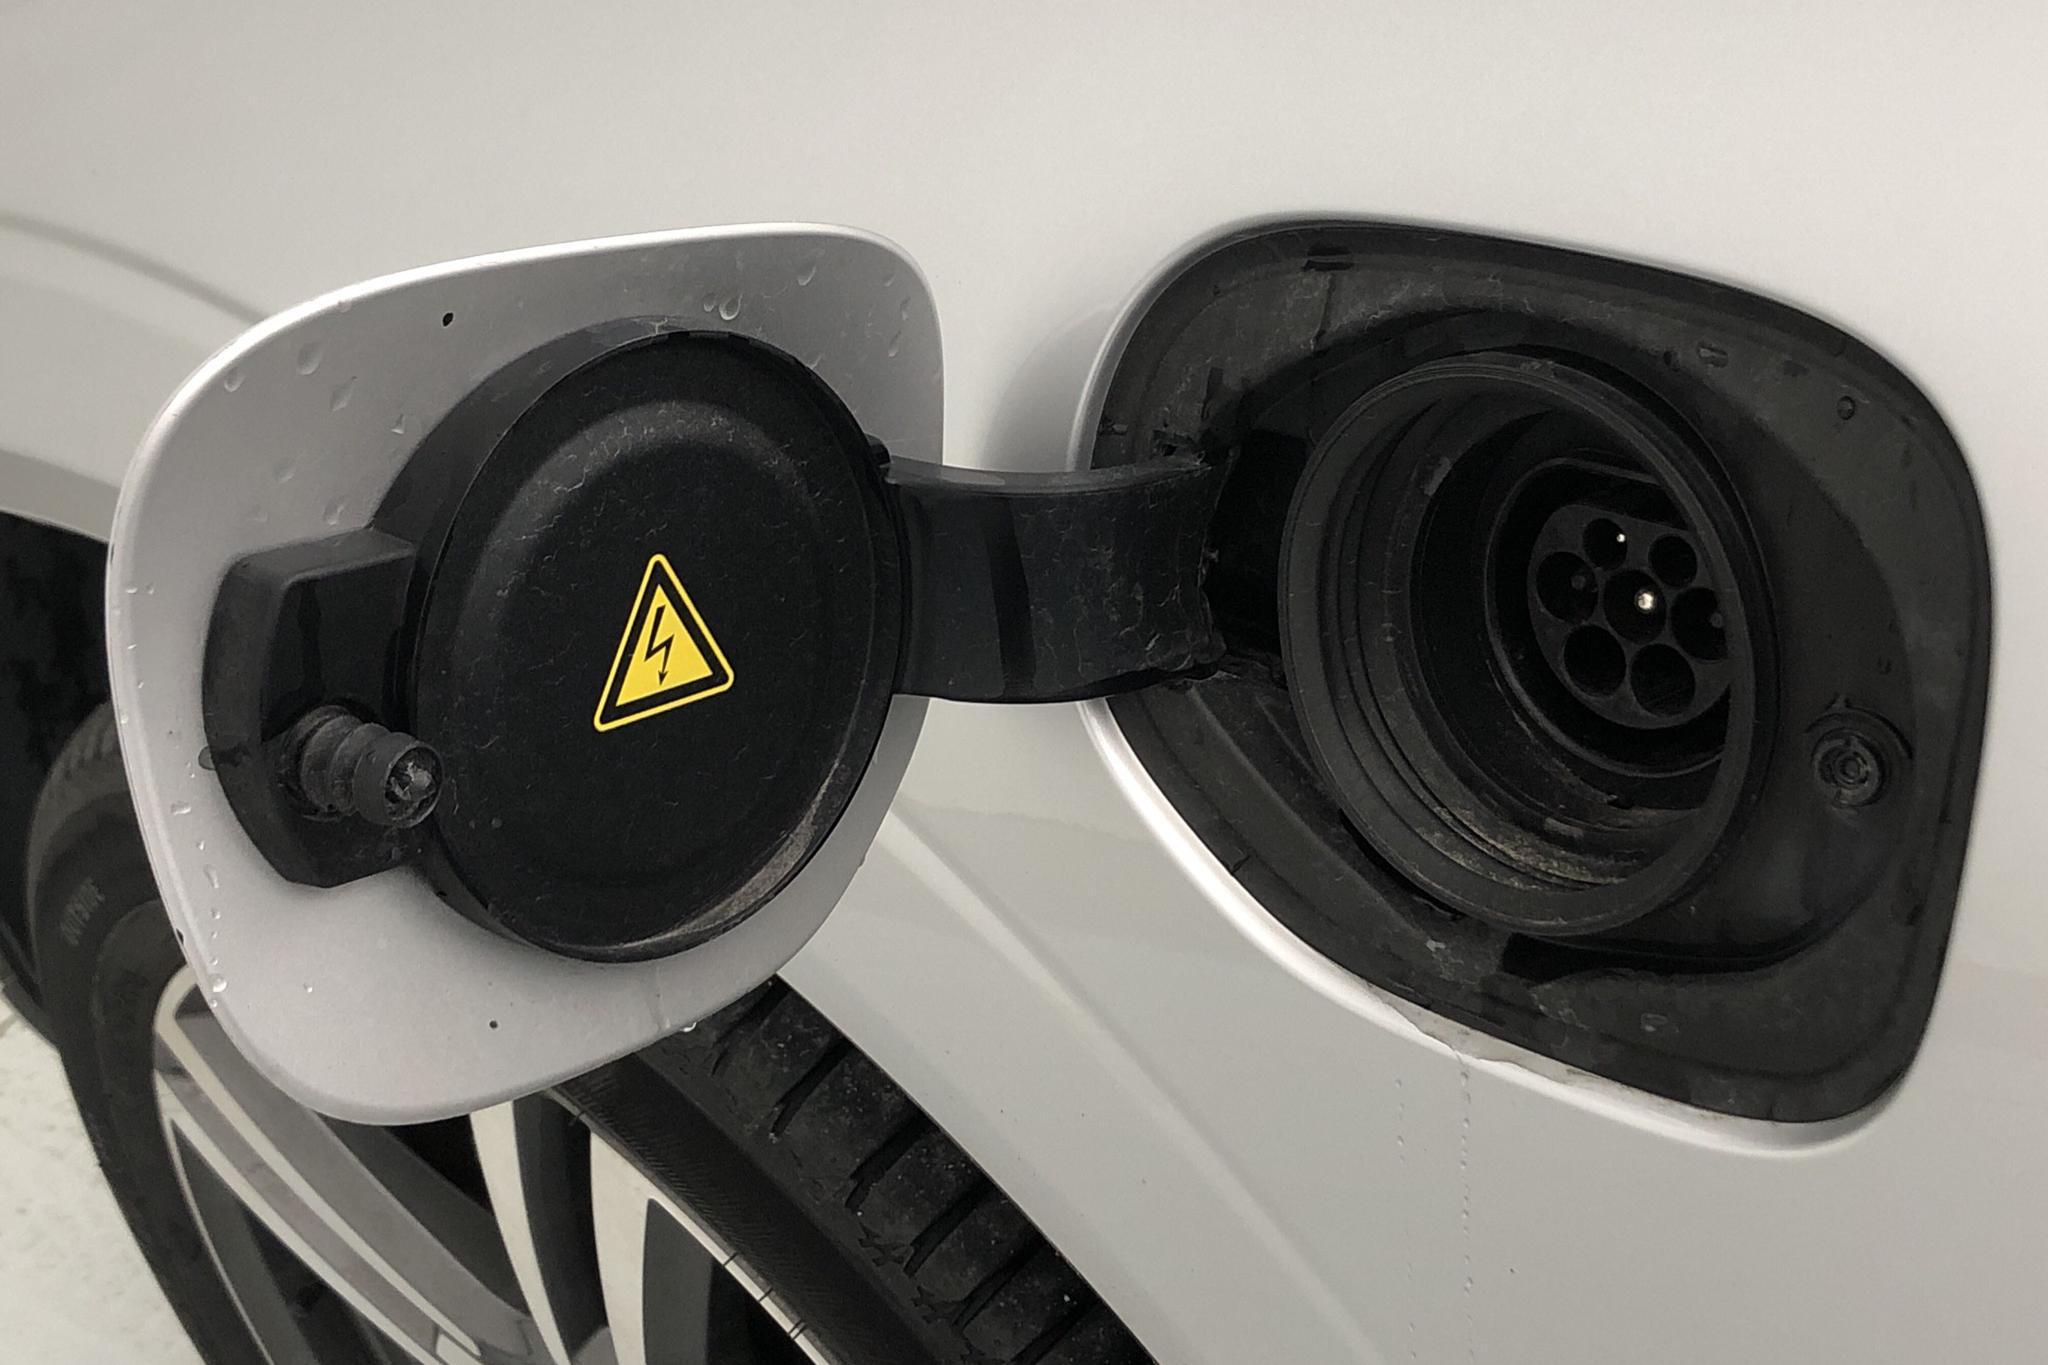 Volvo XC60 T8 AWD Twin Engine (407hk) - 57 190 km - Automatic - silver - 2018